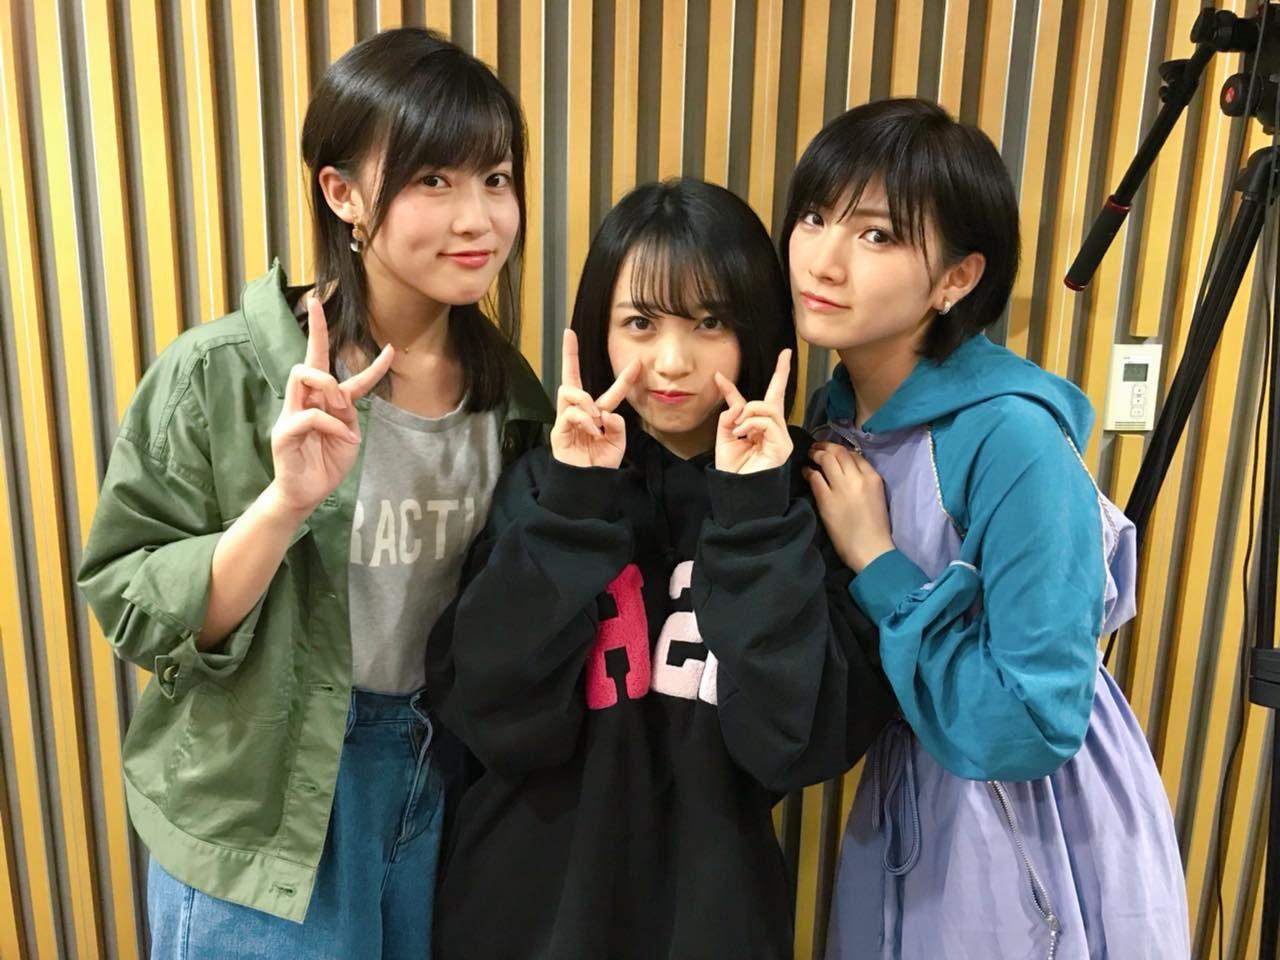 「AKB48のオールナイトニッポン」オフショット * 岡田奈々・岡部麟・向井地美音